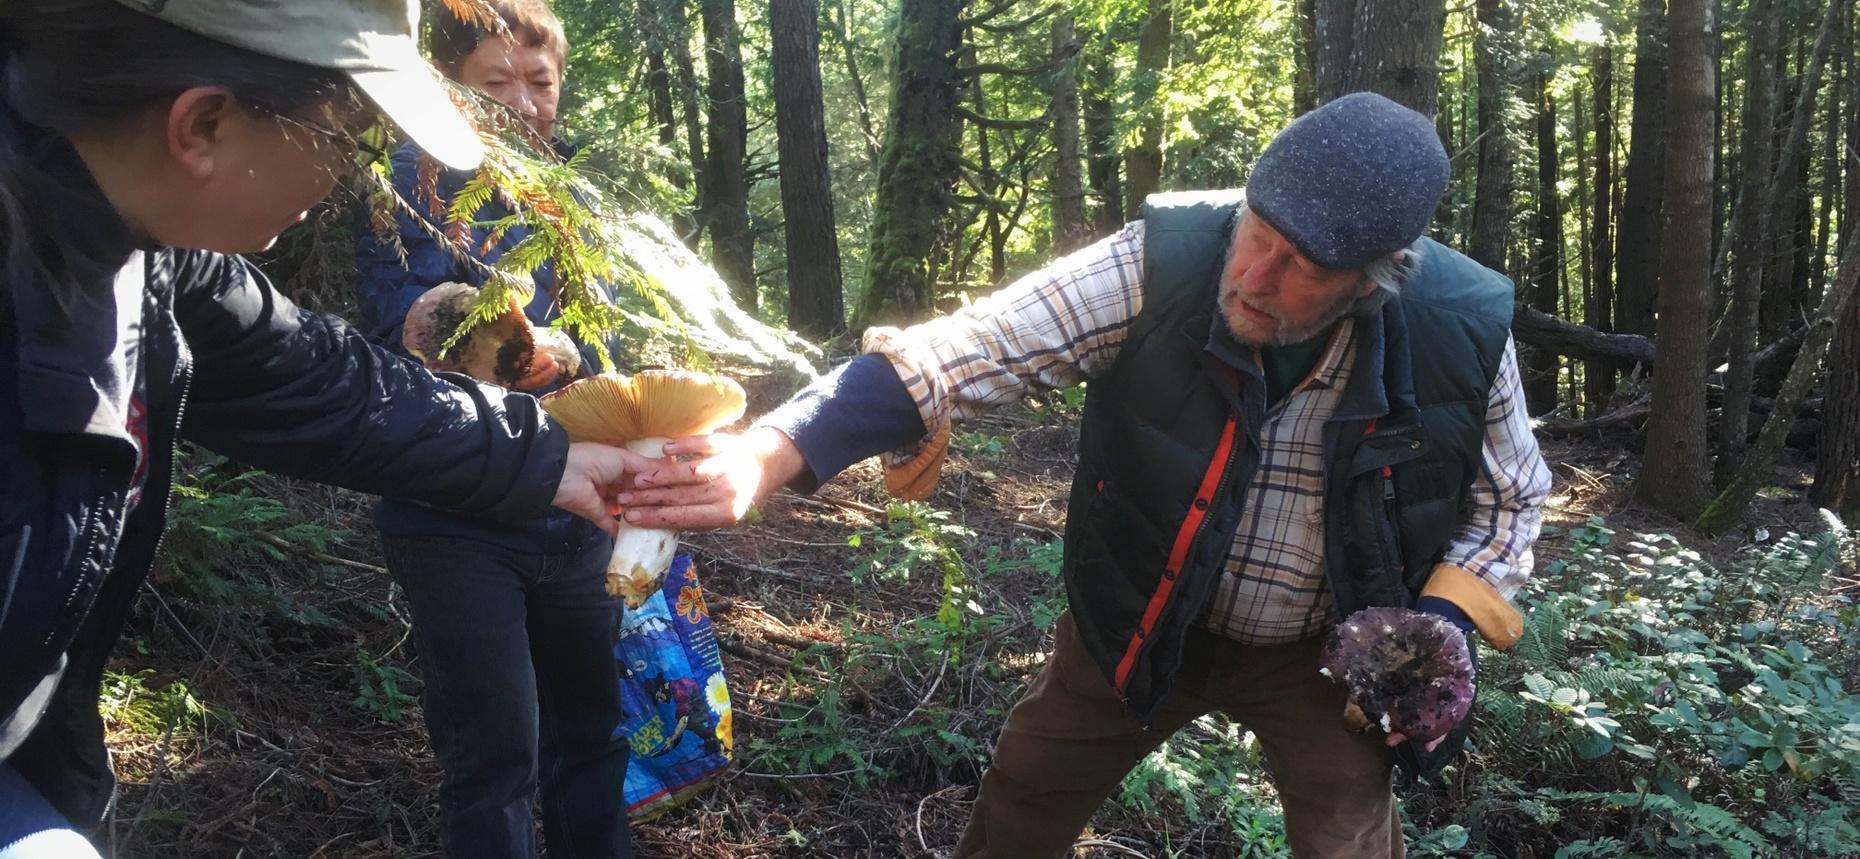 Half-Day Mushroom Foraging Adventure in Sonoma